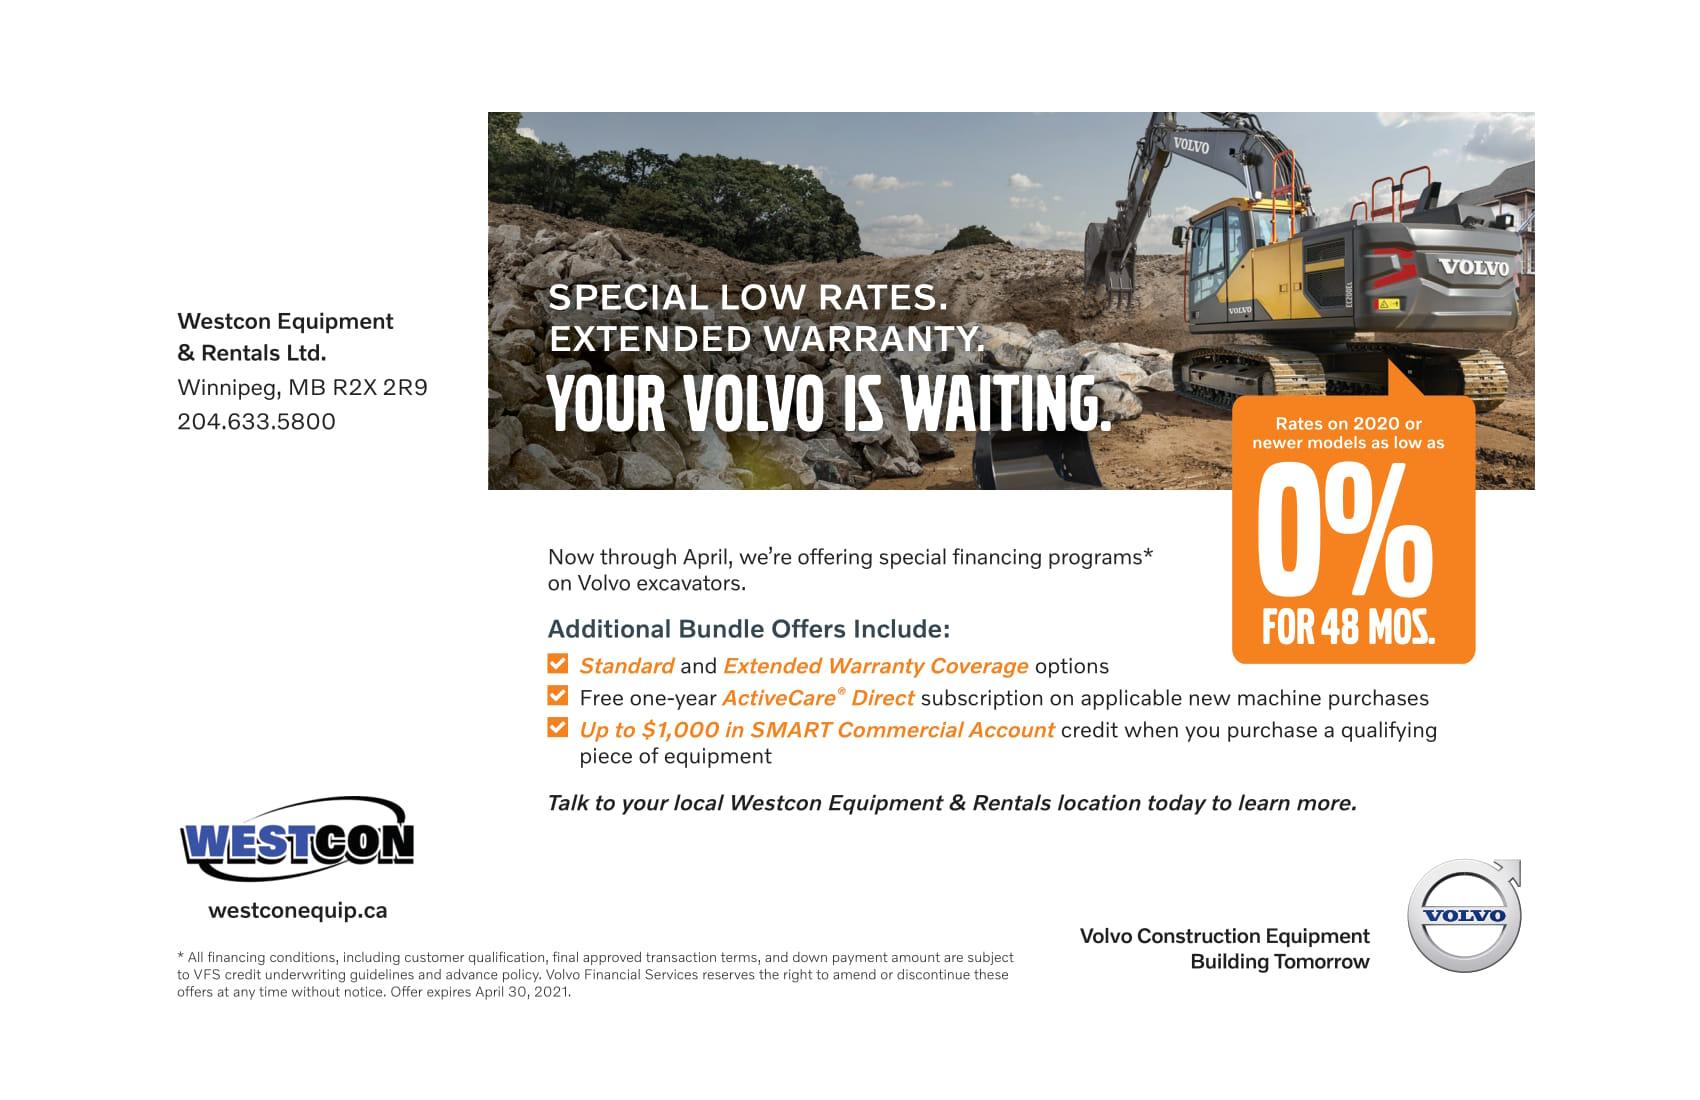 Westcon Equipment & Rentals Ltd.